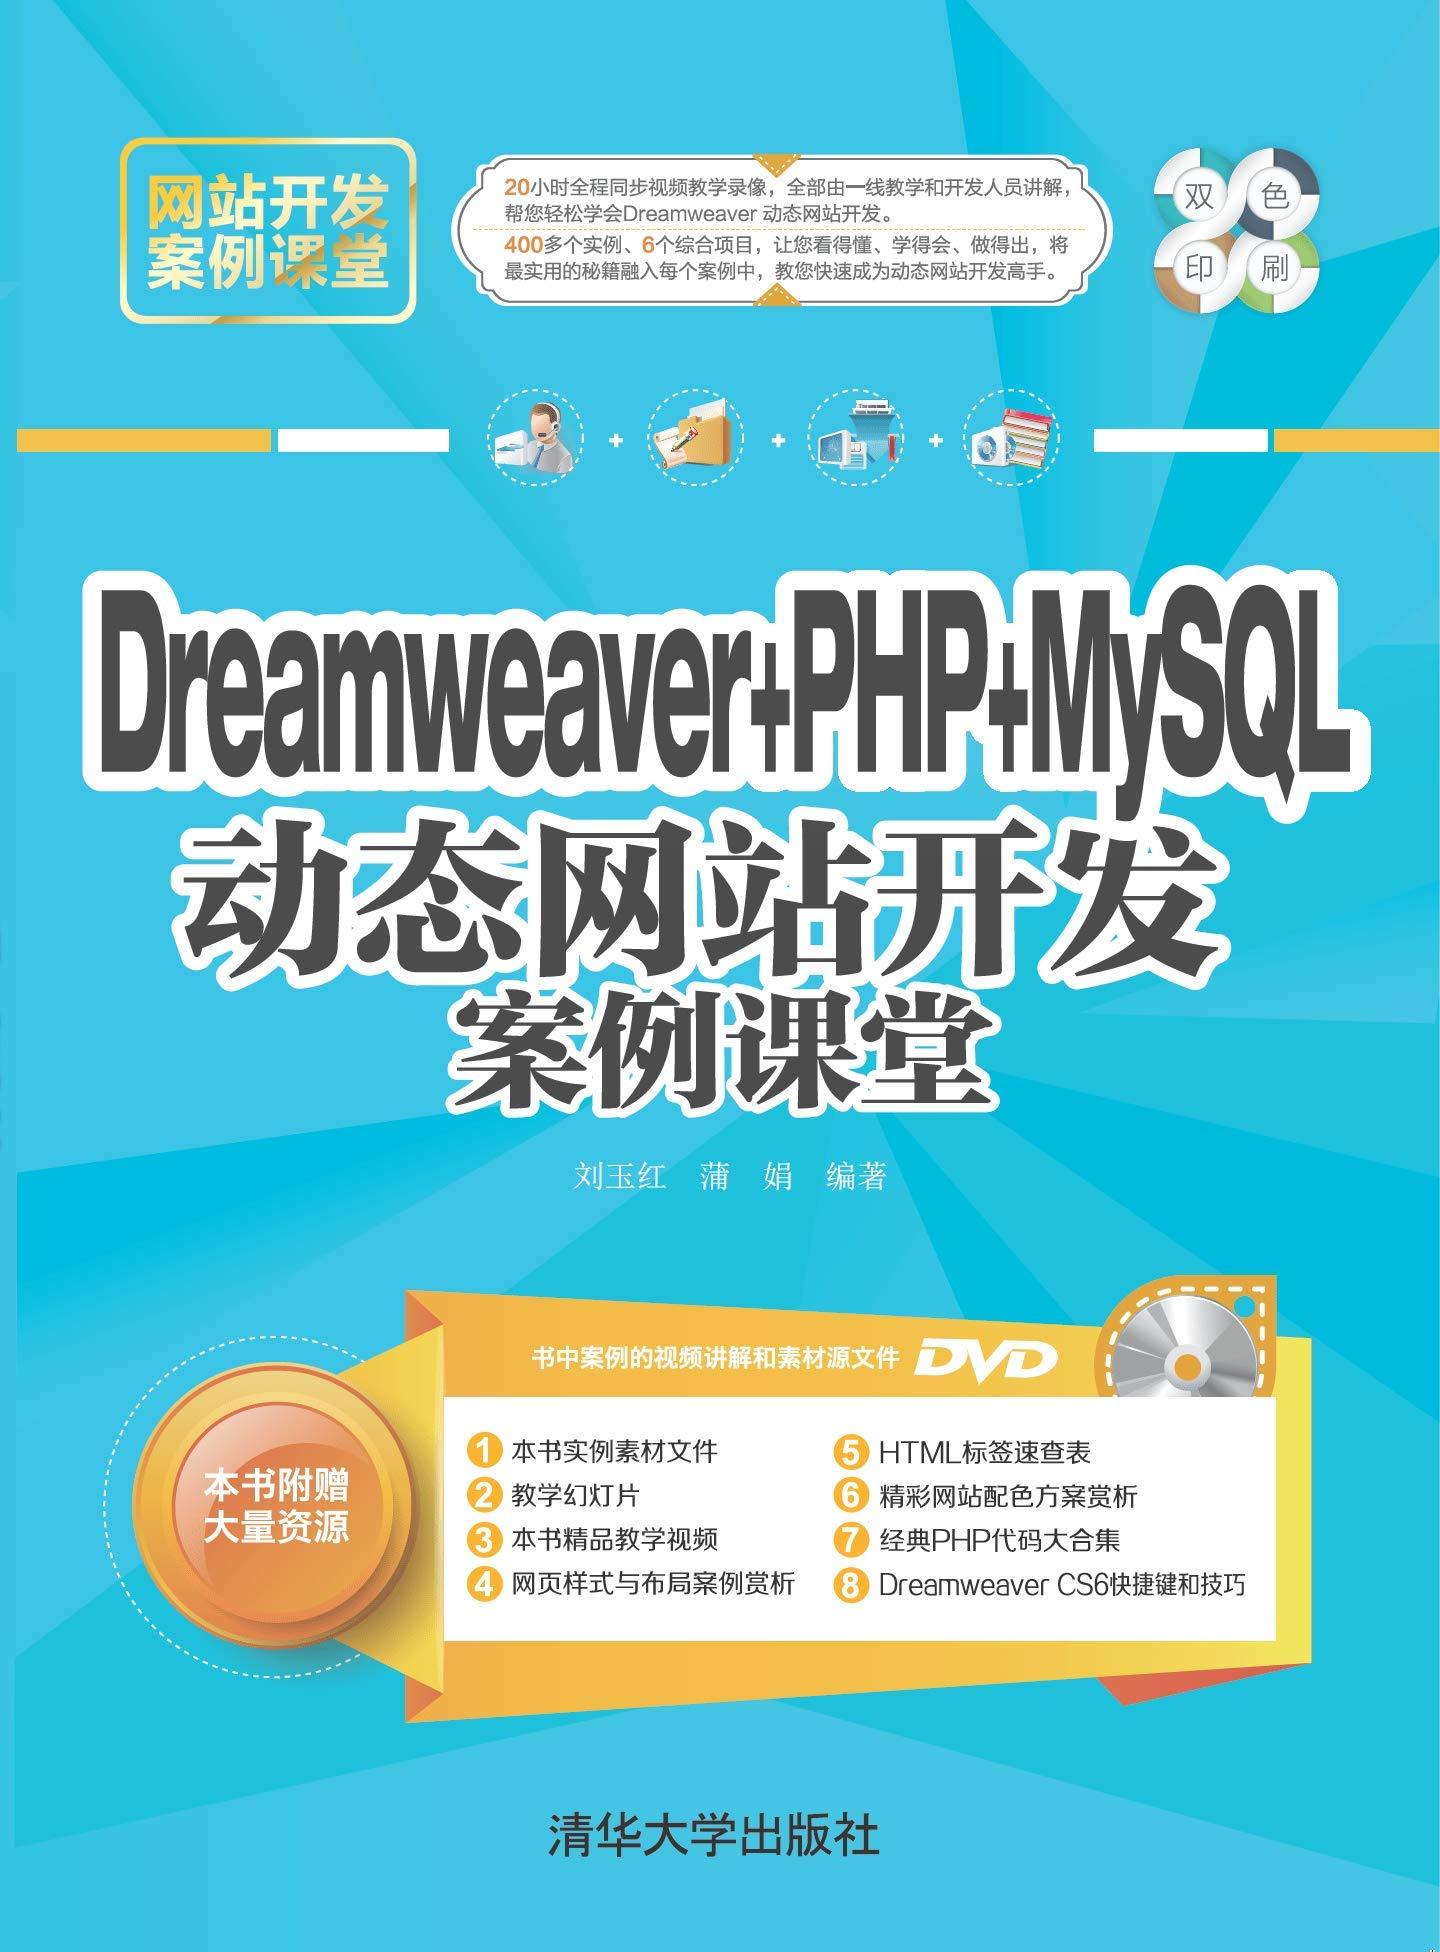 Dreamweaver+PHP+MySQL动态网站开发案例课堂 (Chinese Edition)